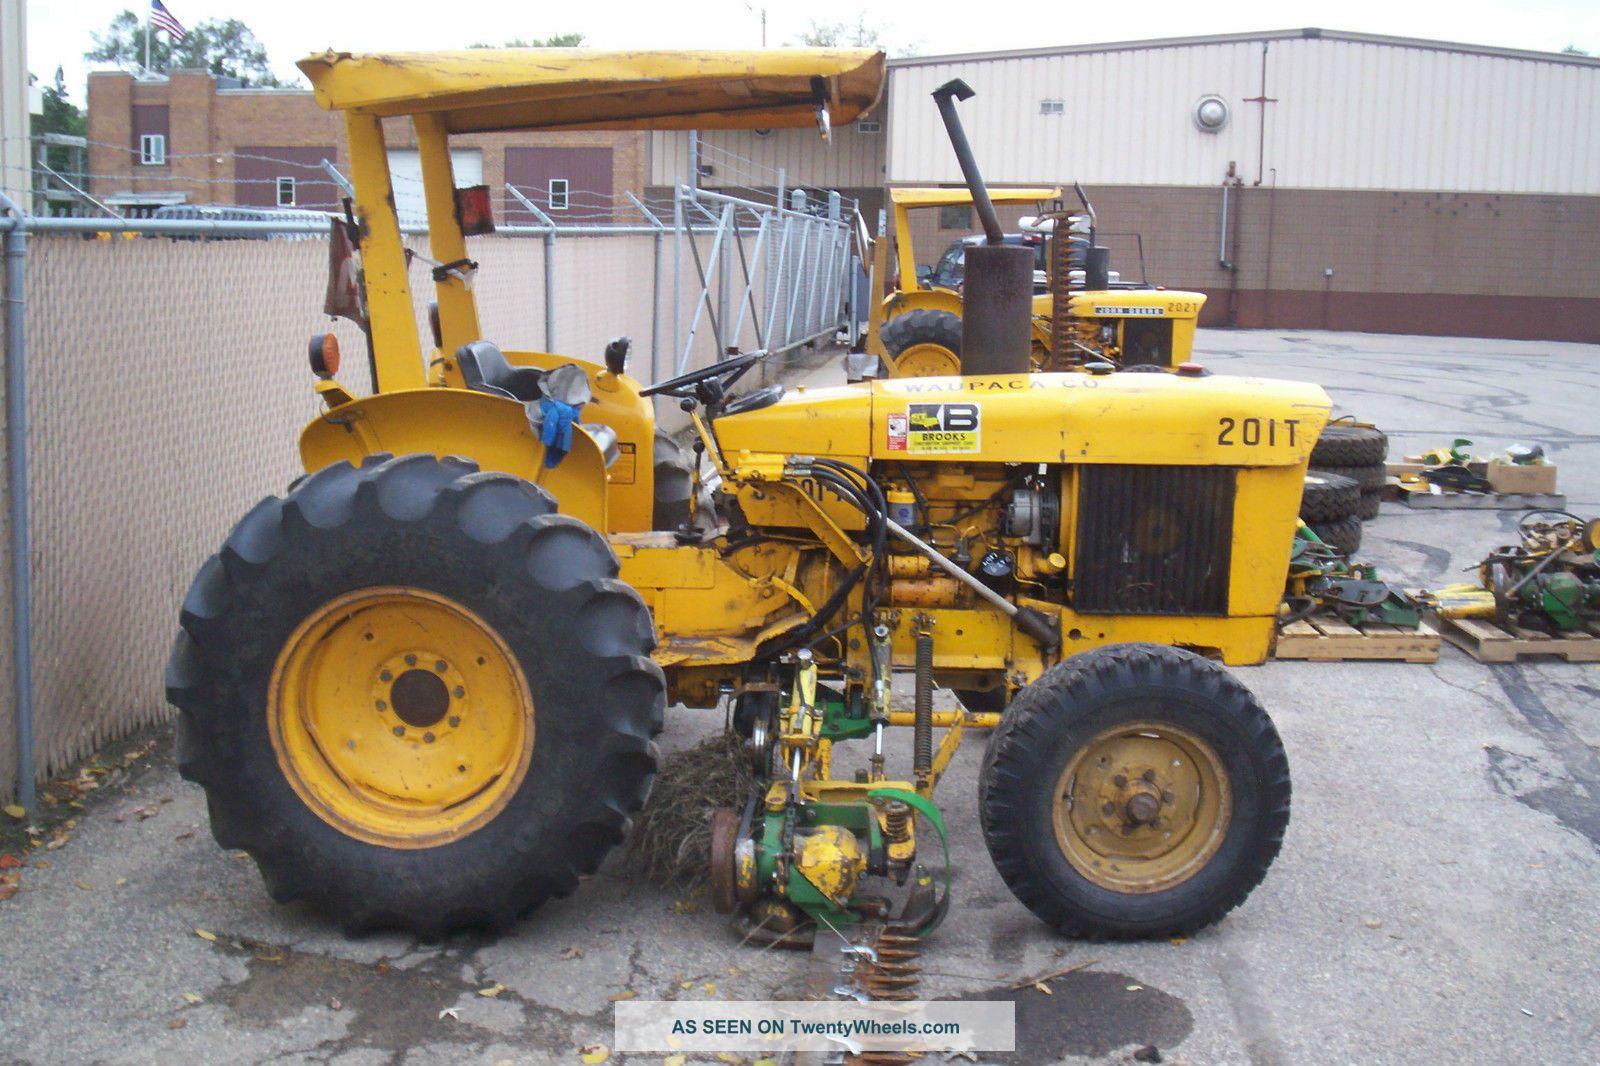 Jd301ad john deere tractor w sickle mower for Sickle mower for garden tractor